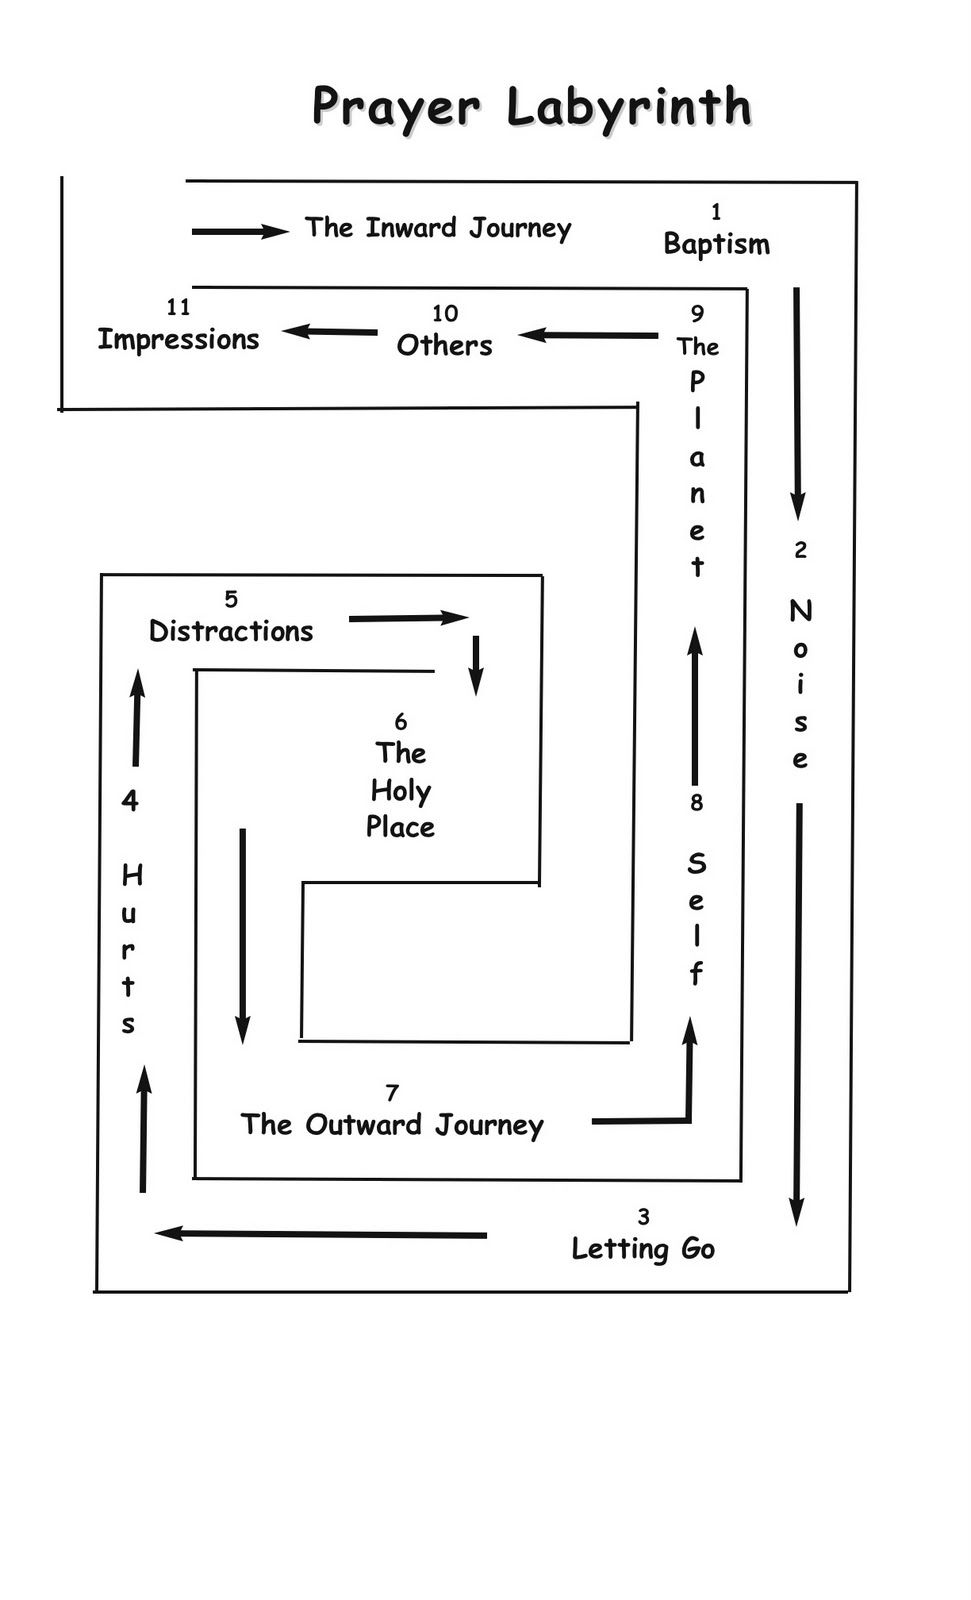 Prayer Labyrinth 1-27-07_Layout 1